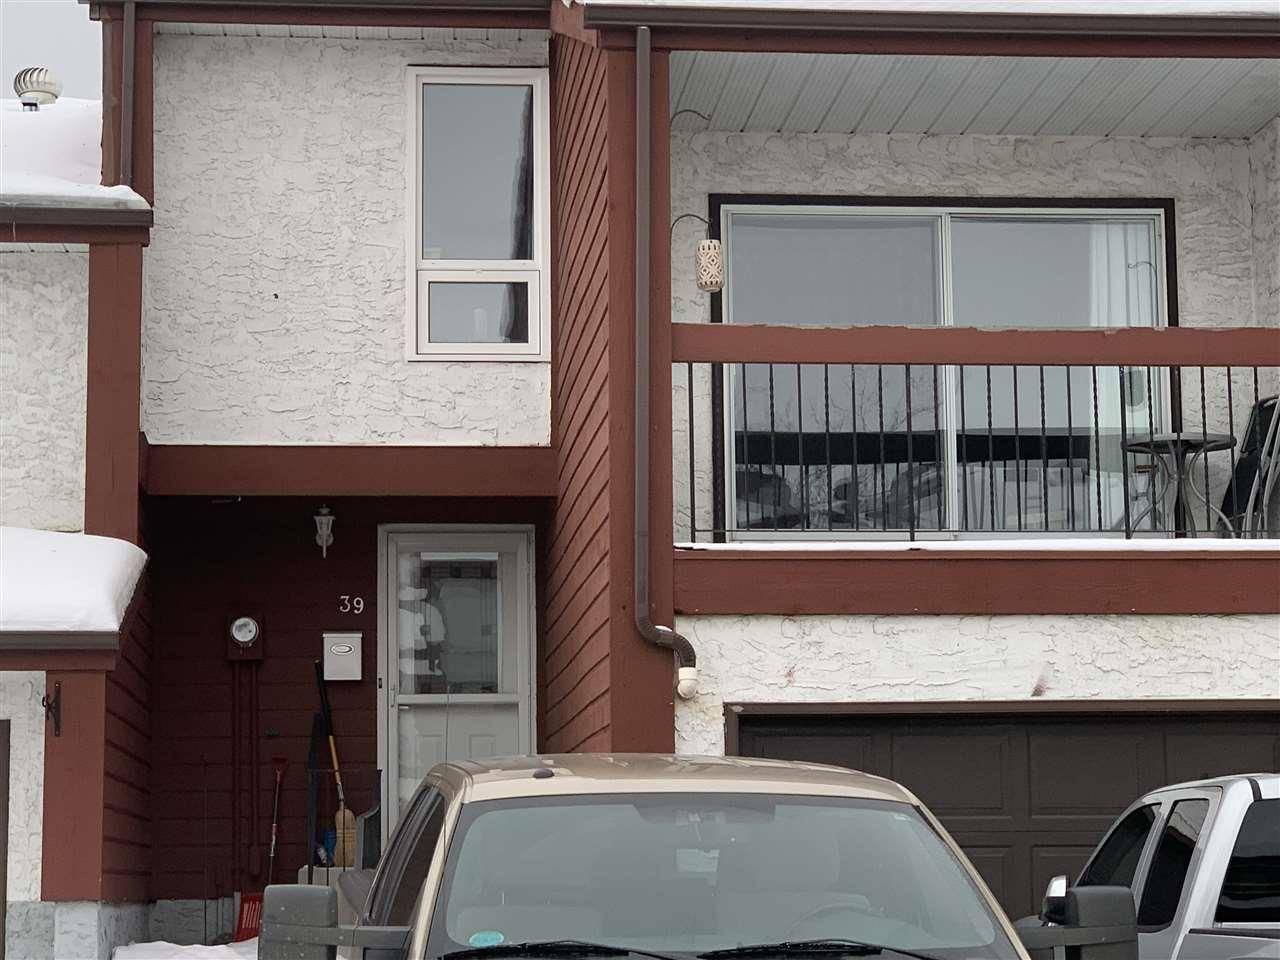 Townhouse for sale at 39 Lorelei Cs Nw Edmonton Alberta - MLS: E4186595